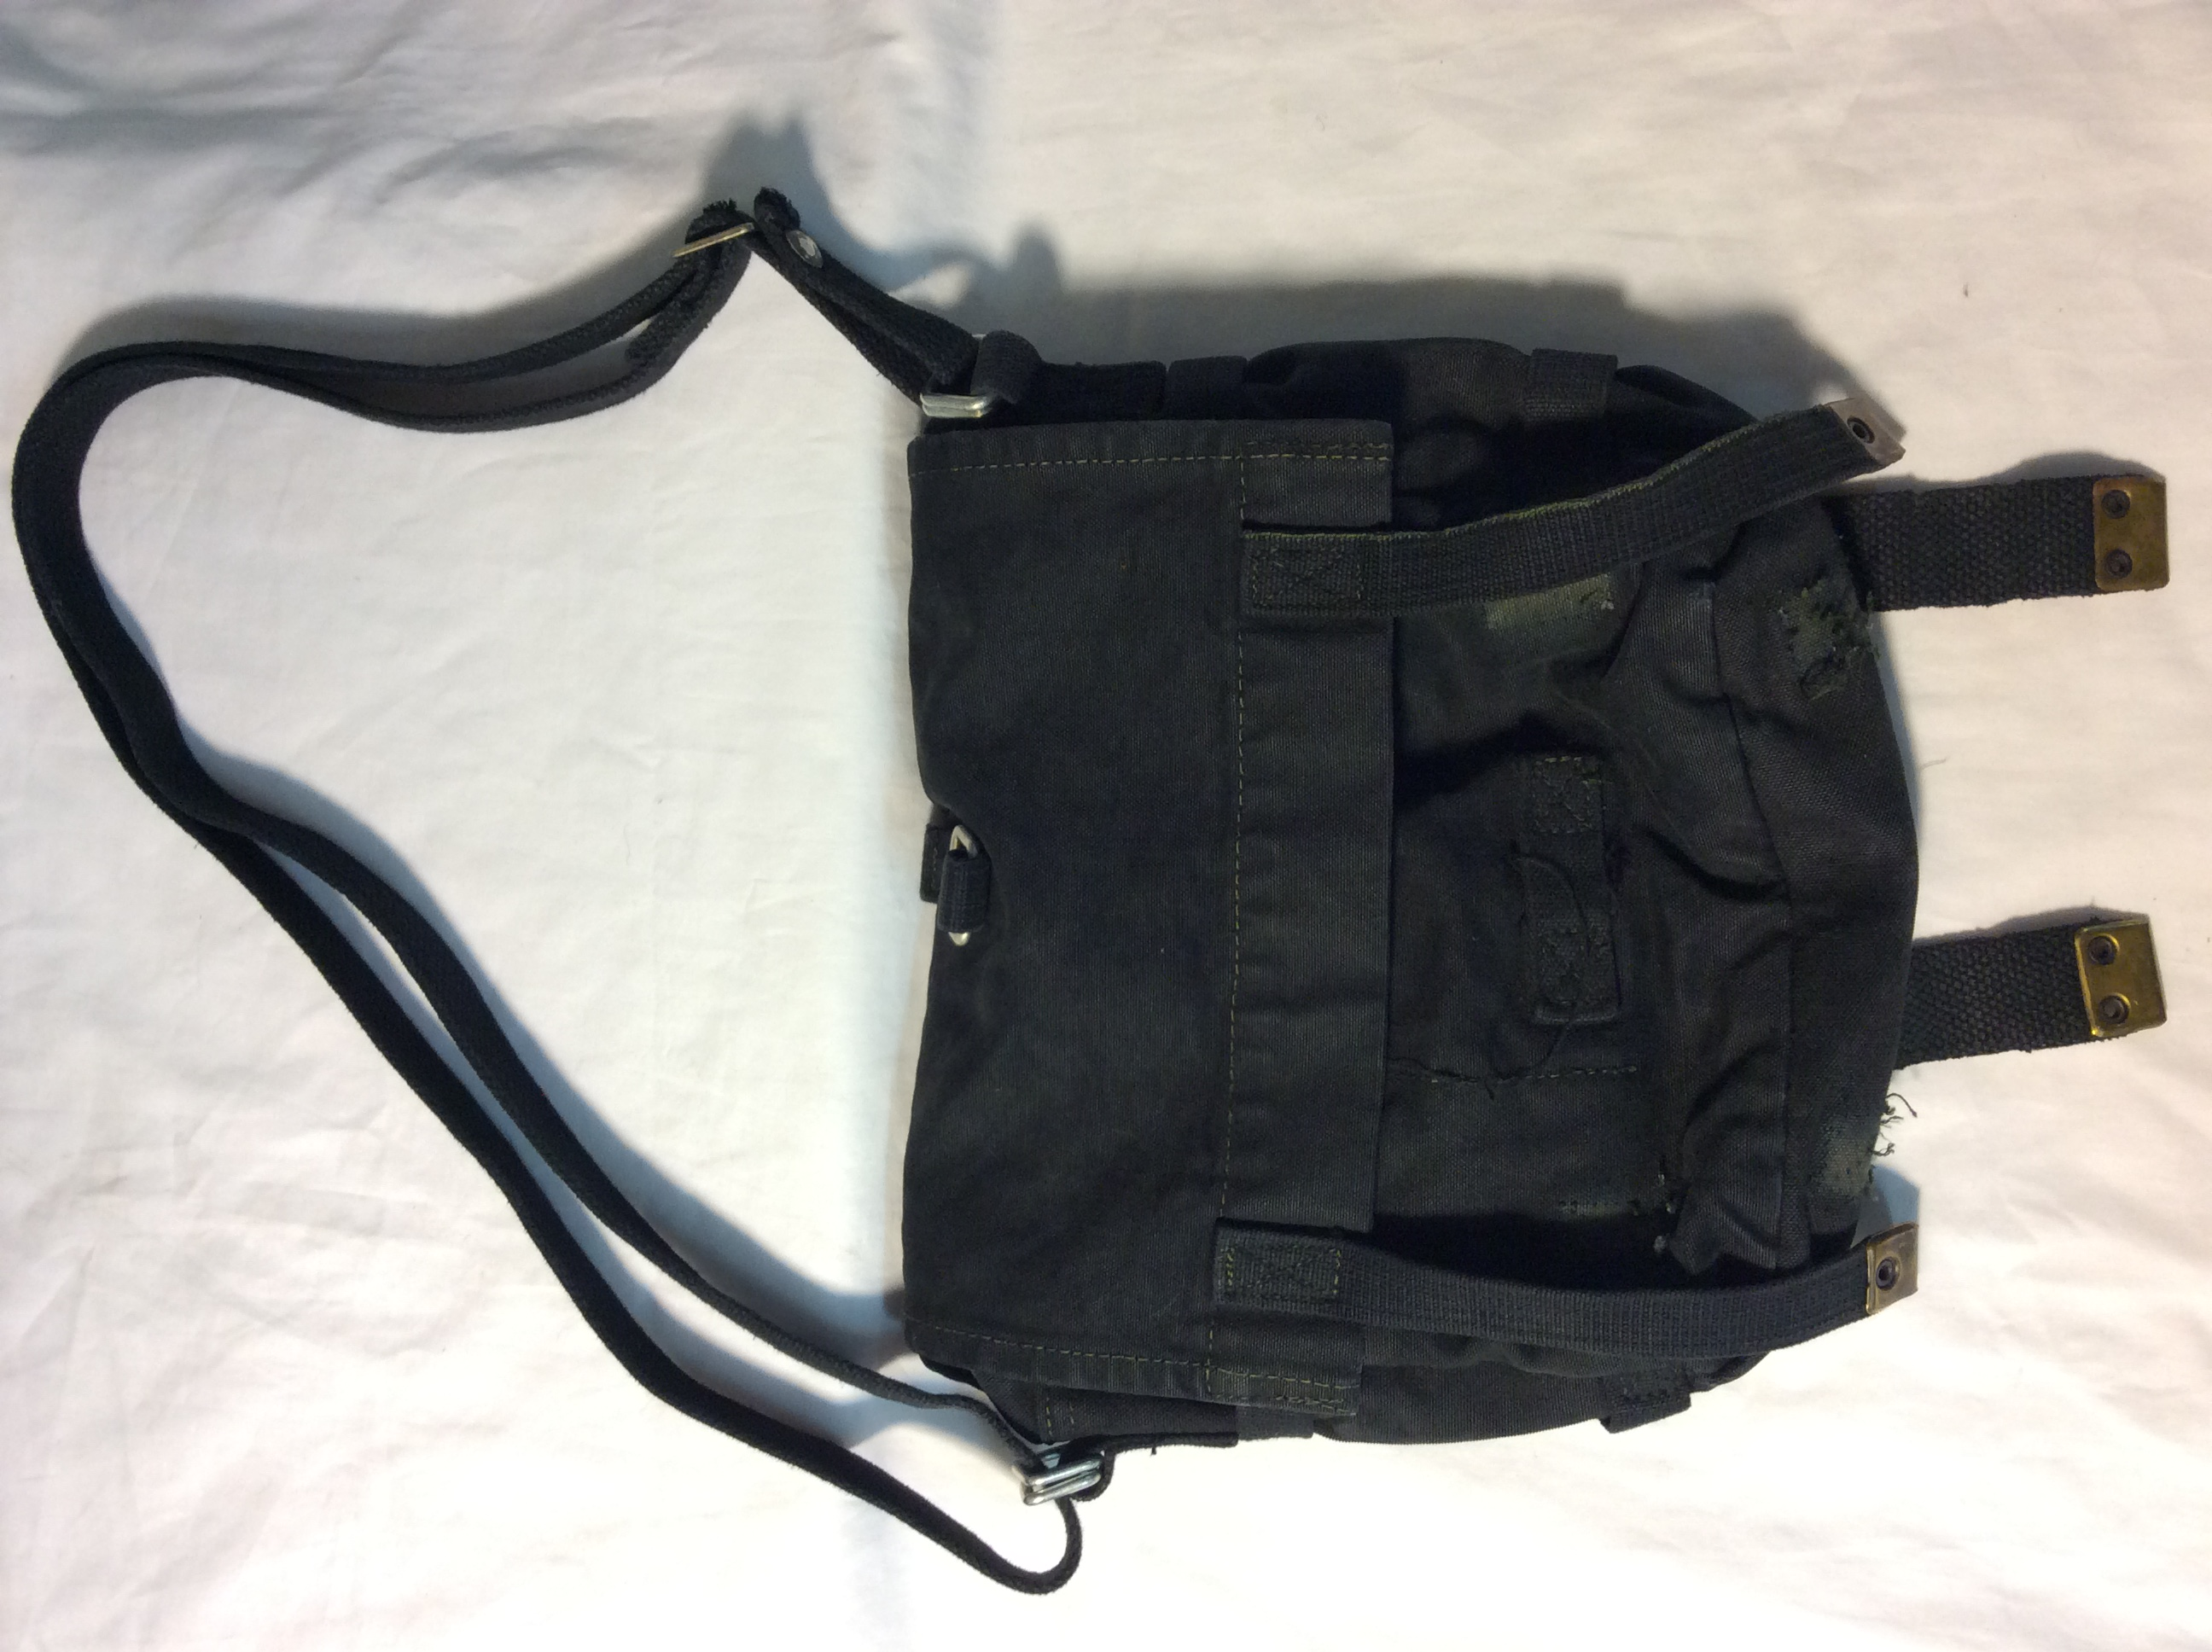 Worn black cloth bag